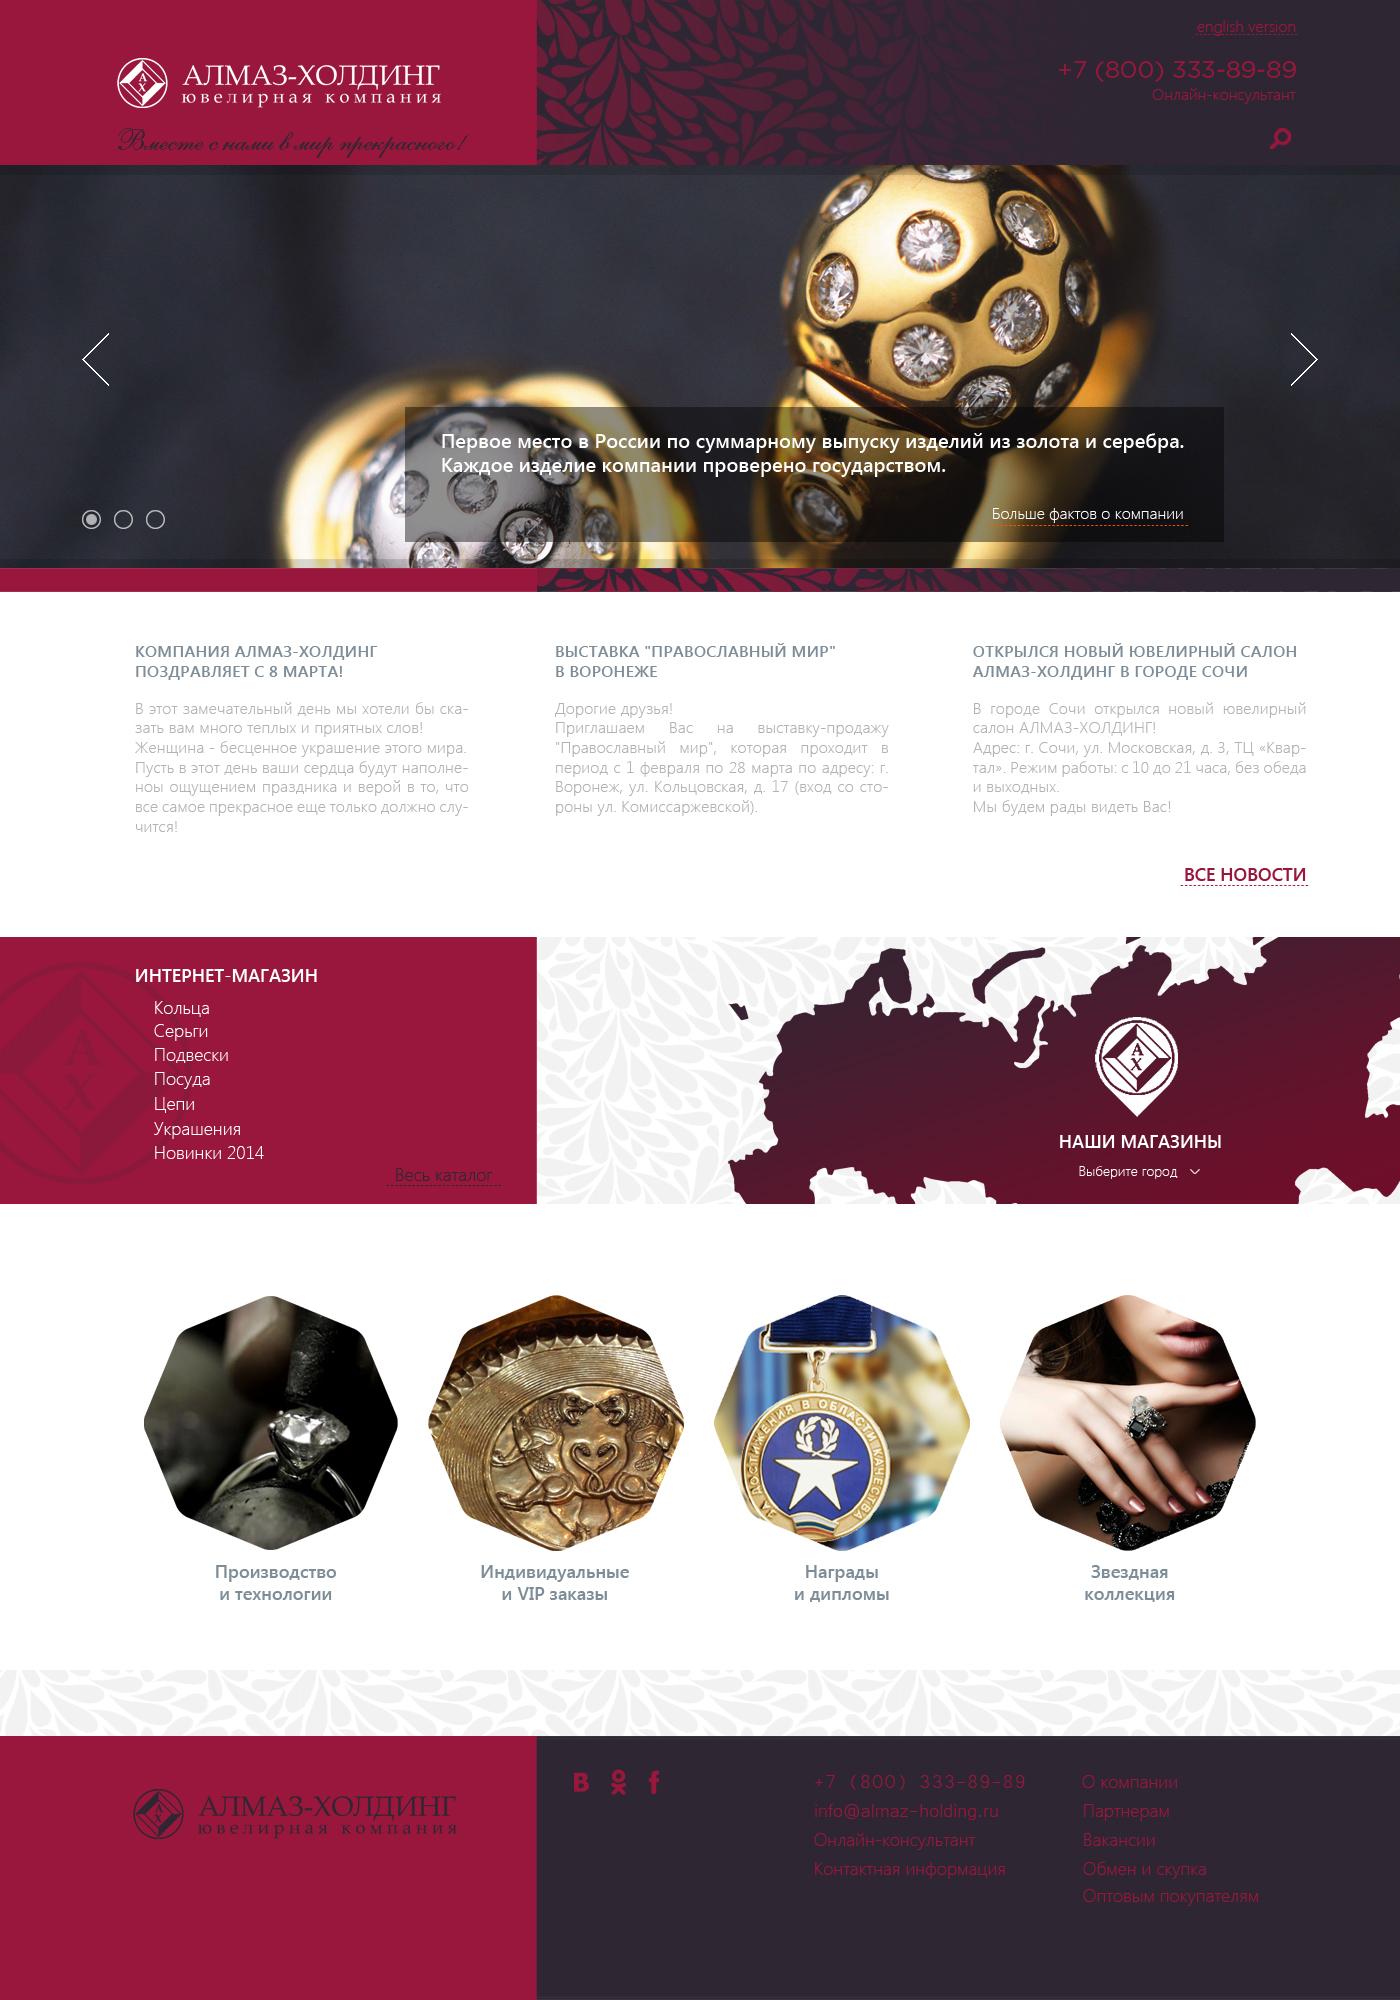 Дизайн сайта для ювелирной компании Алмаз-Холдинг фото f_276531f43ef70780.jpg